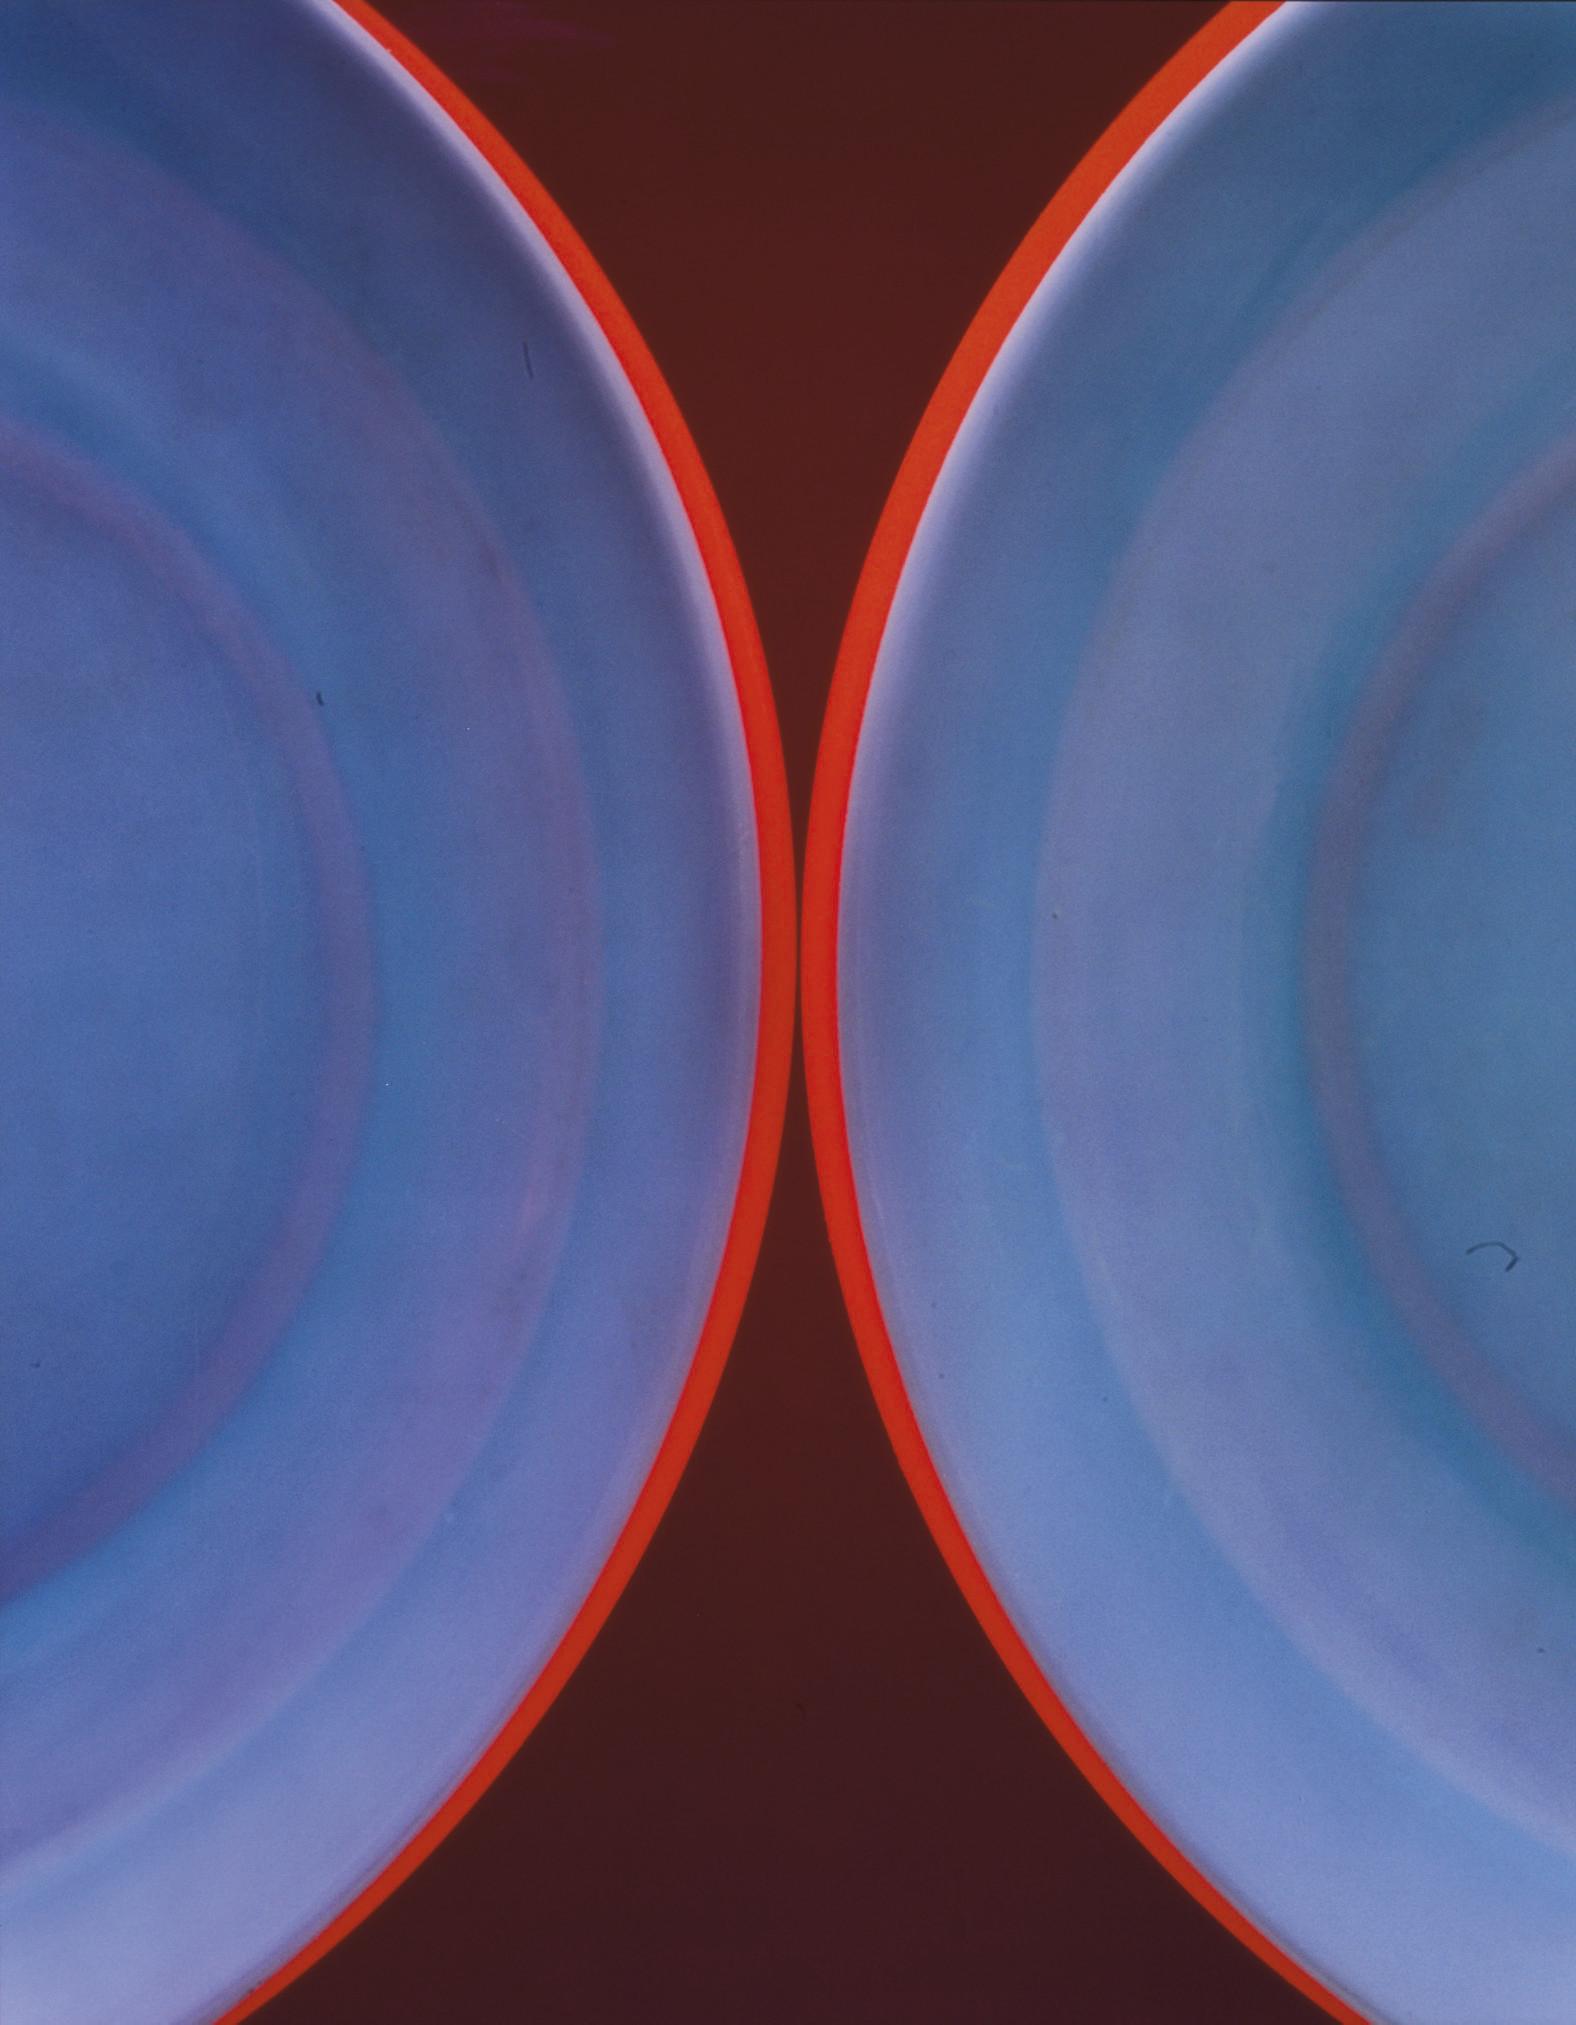 Untitled 136, 2000